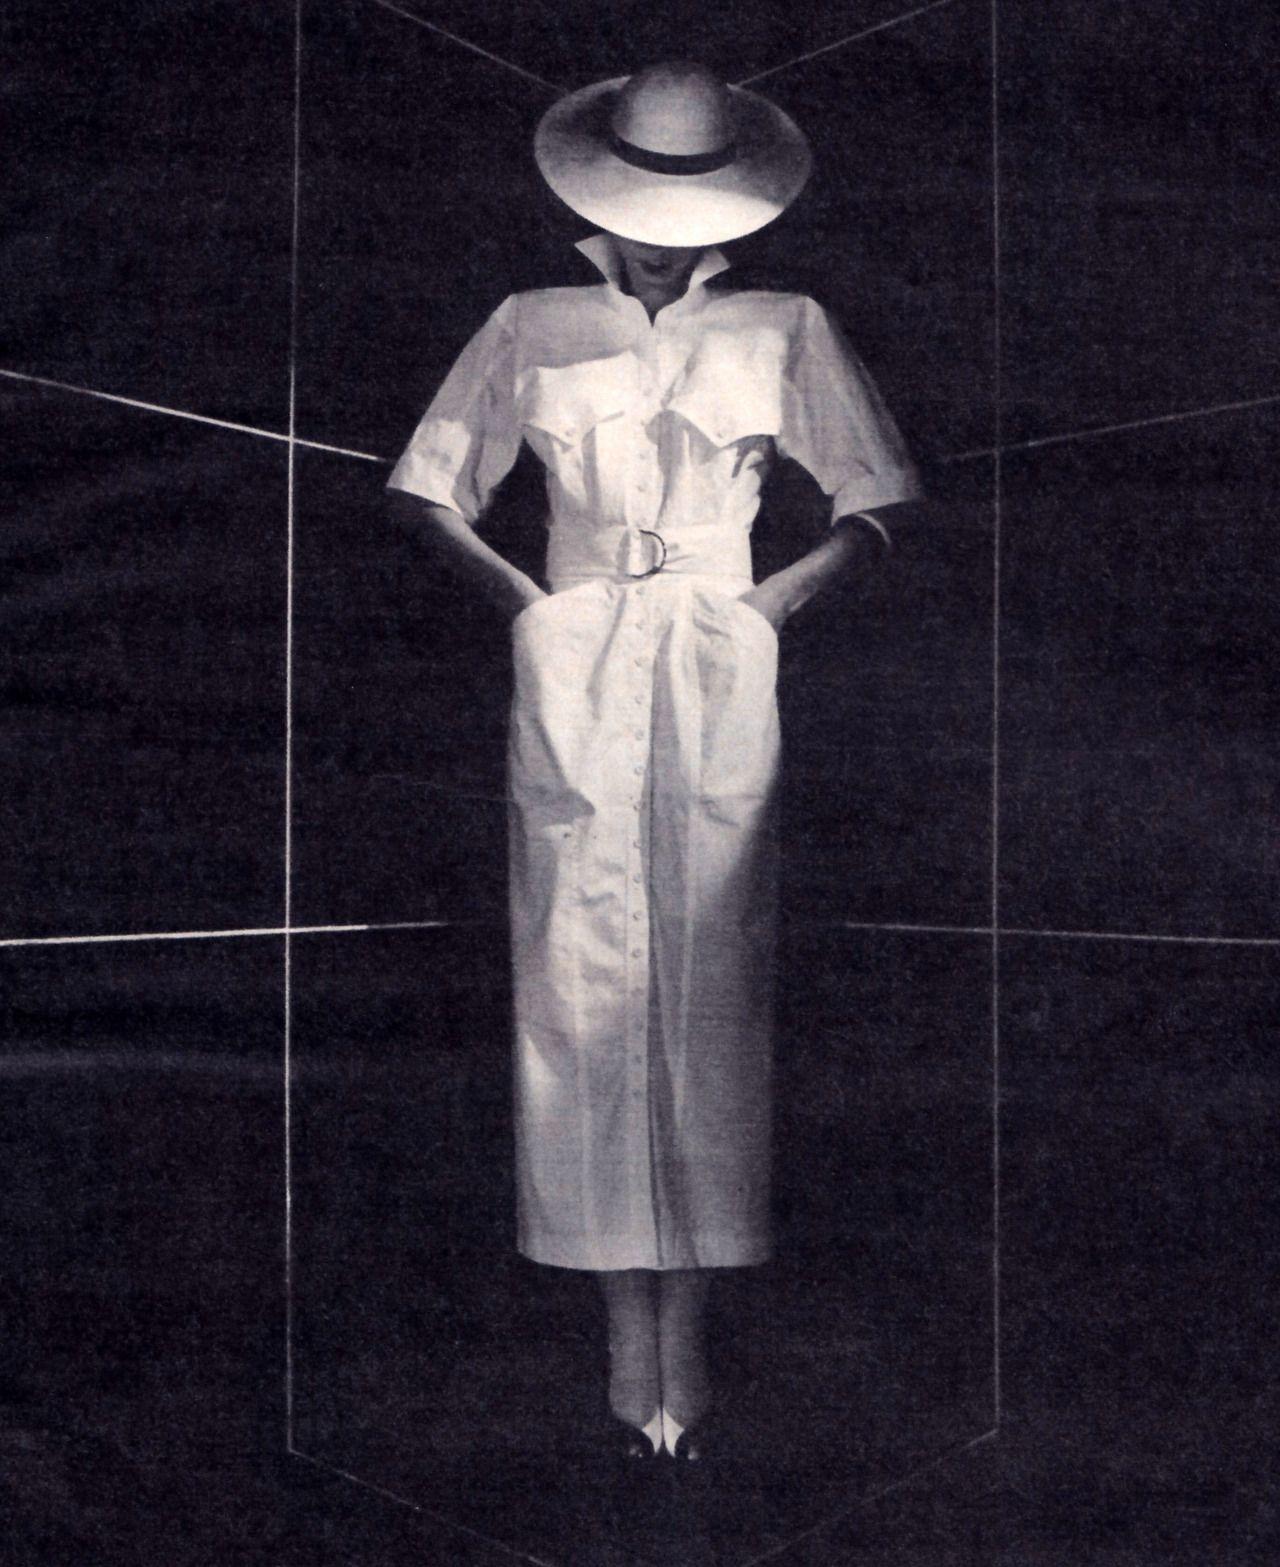 Karen Alexander/Robinson's, Glamour magazine, May 1985.